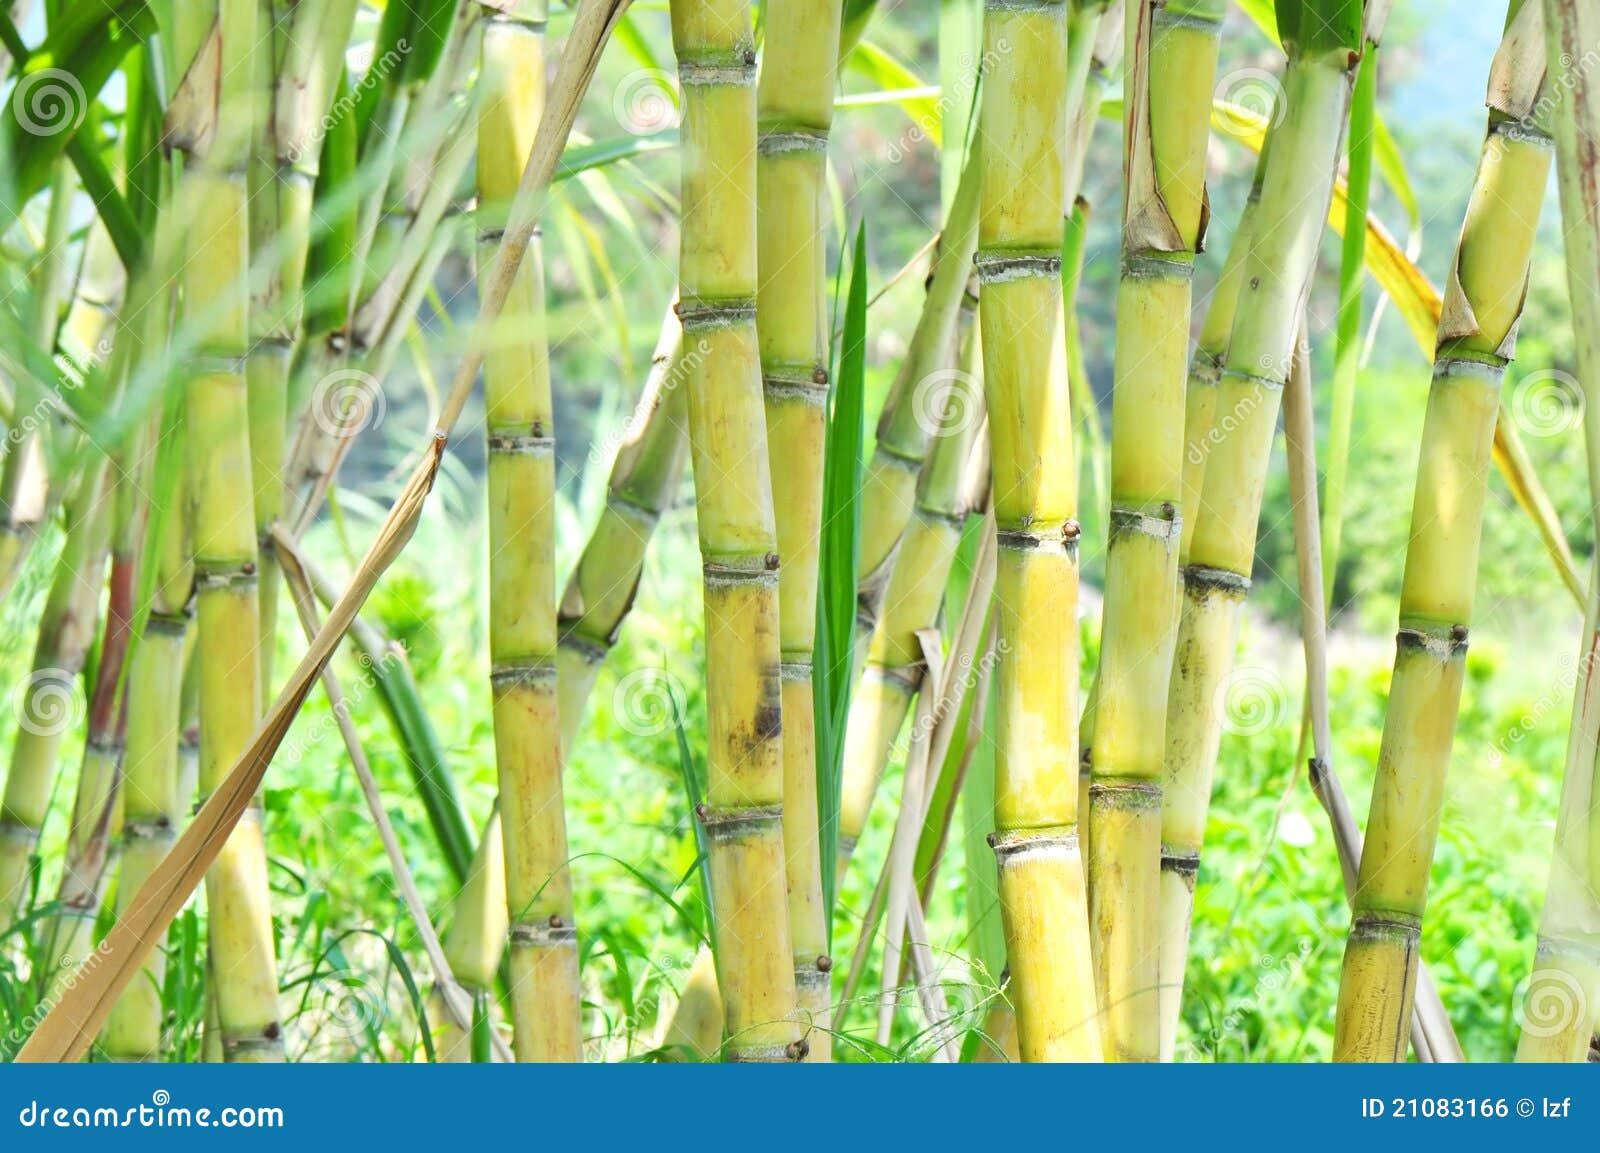 Sugar Cane Plants Royalty Free Stock Image